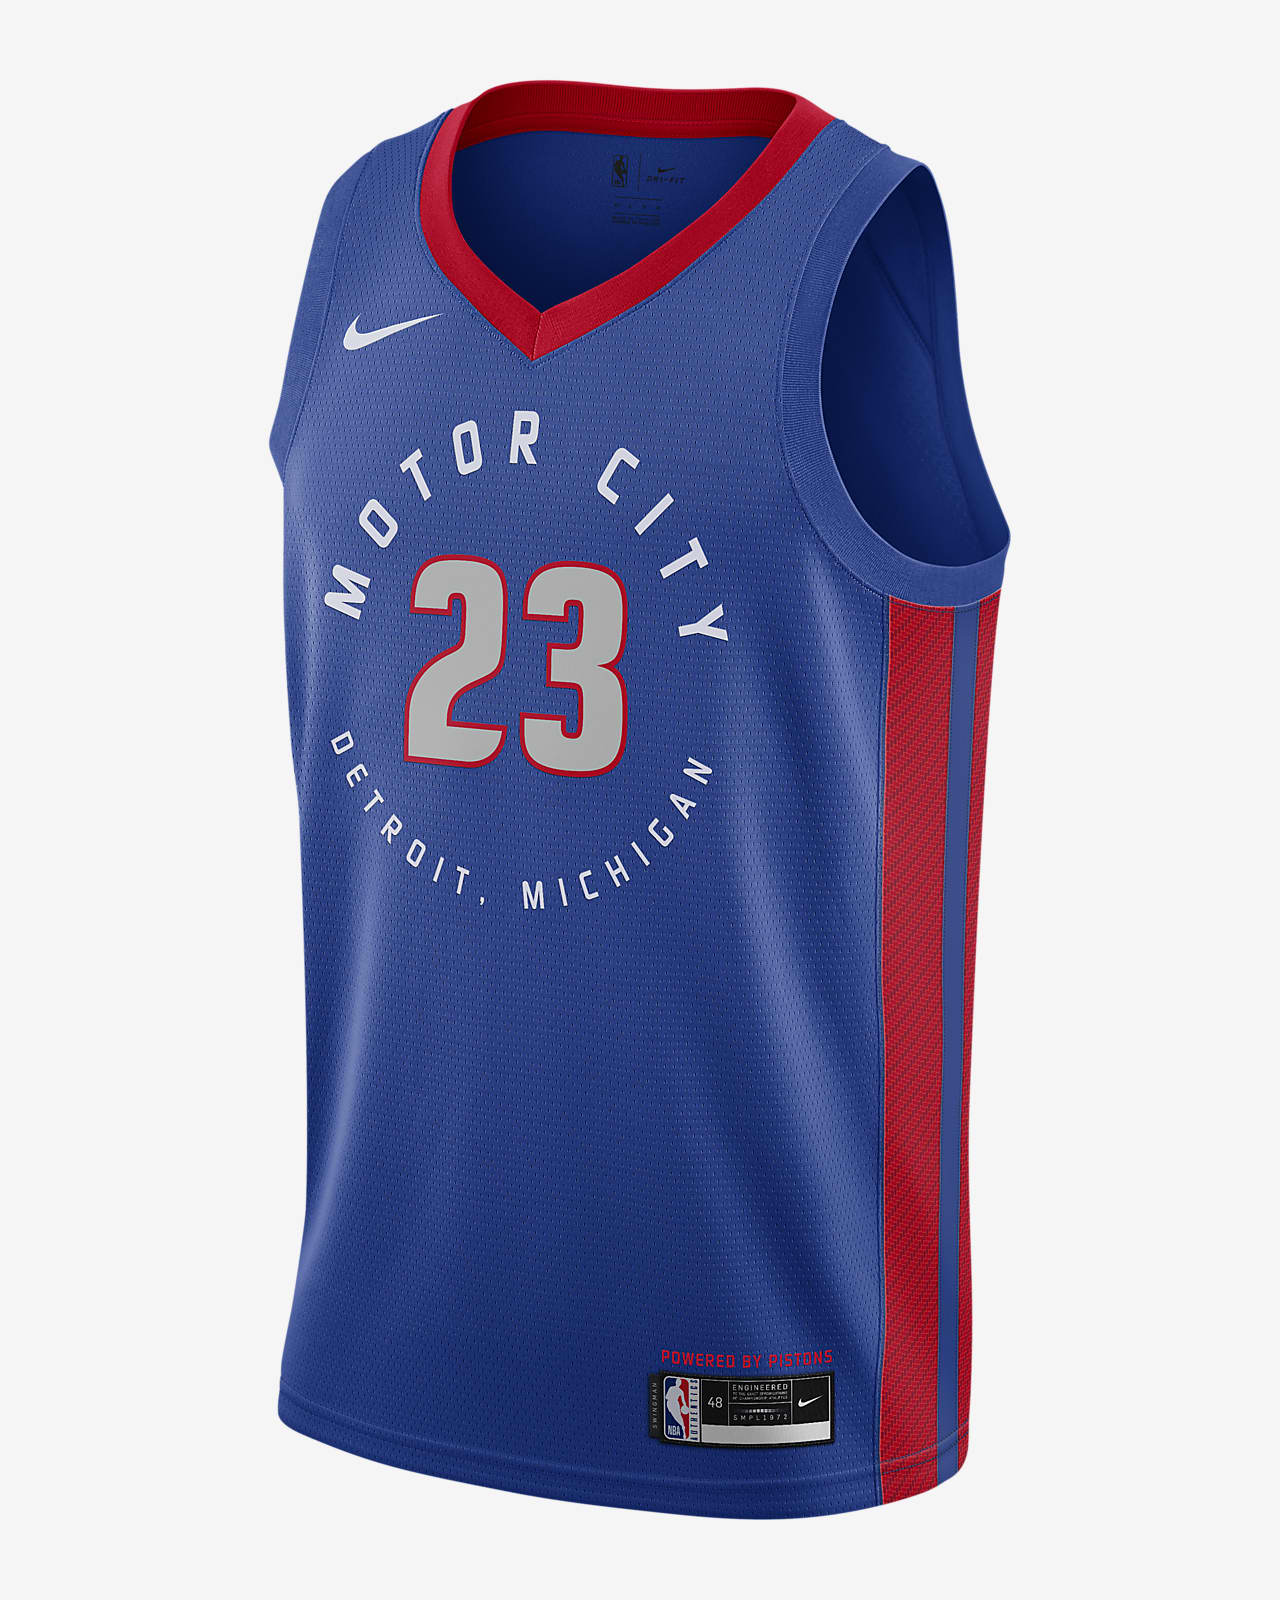 Detroit Pistons City Edition Nike NBA Swingman Jersey